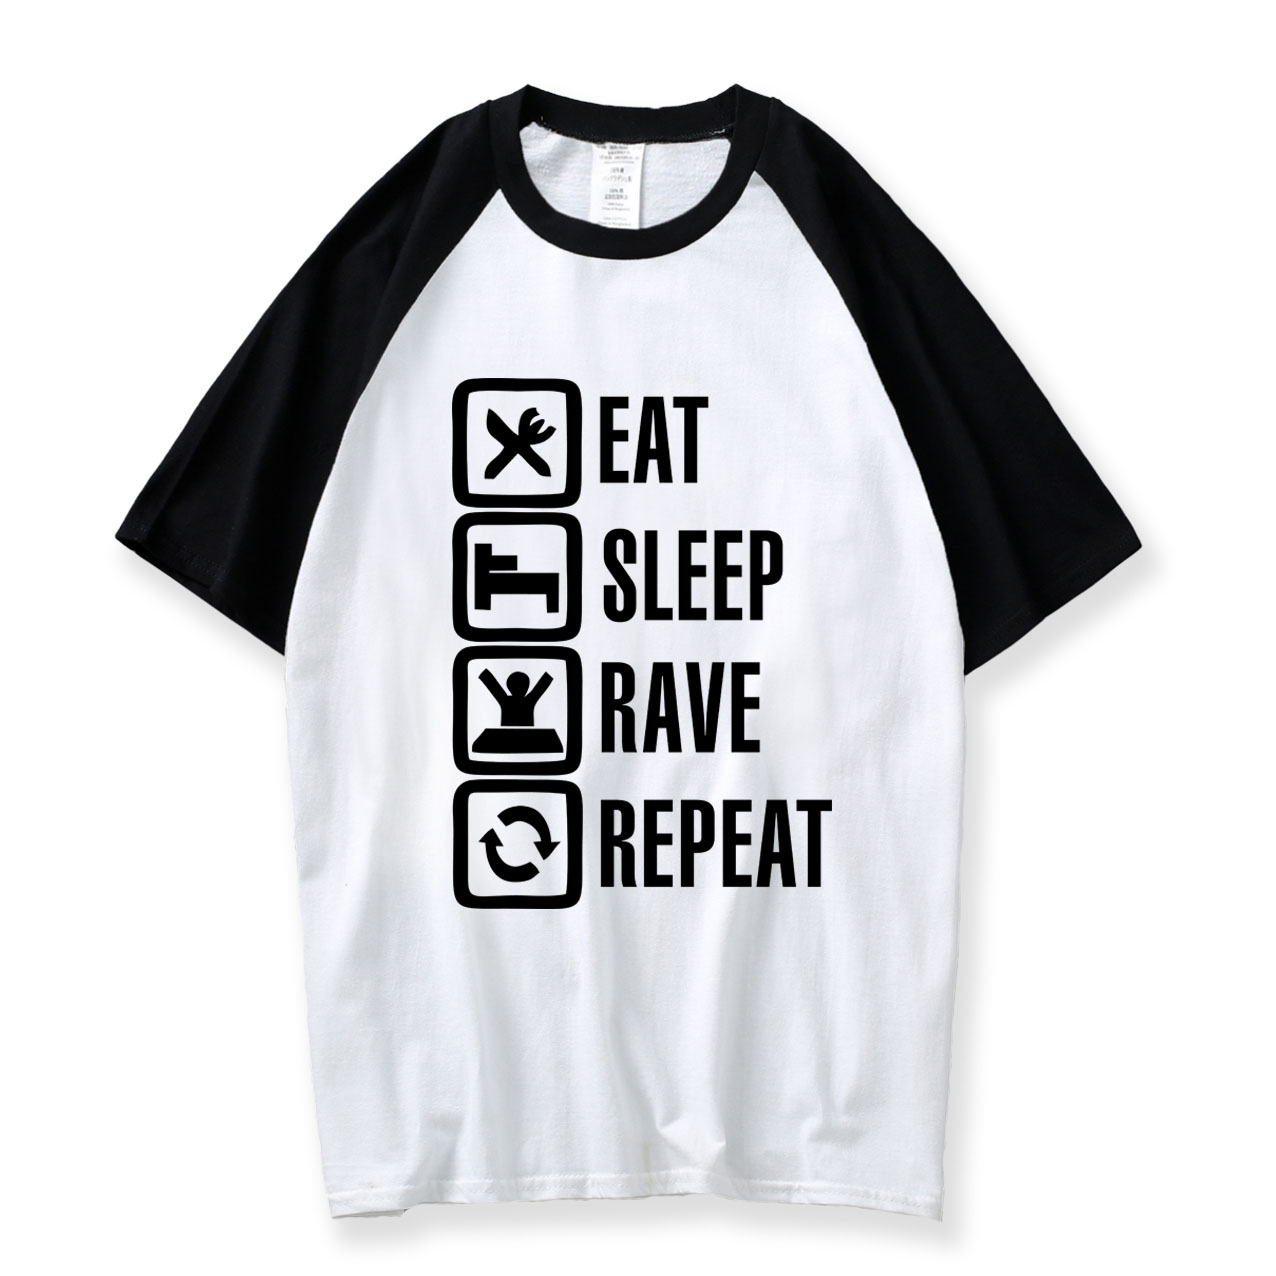 Eat Sleep Game Men T Shirts Raglan Sleeve T Shirt 2018 Summer Casual College Male T-shirt Round Neck Mens Tshirt Free Shipping